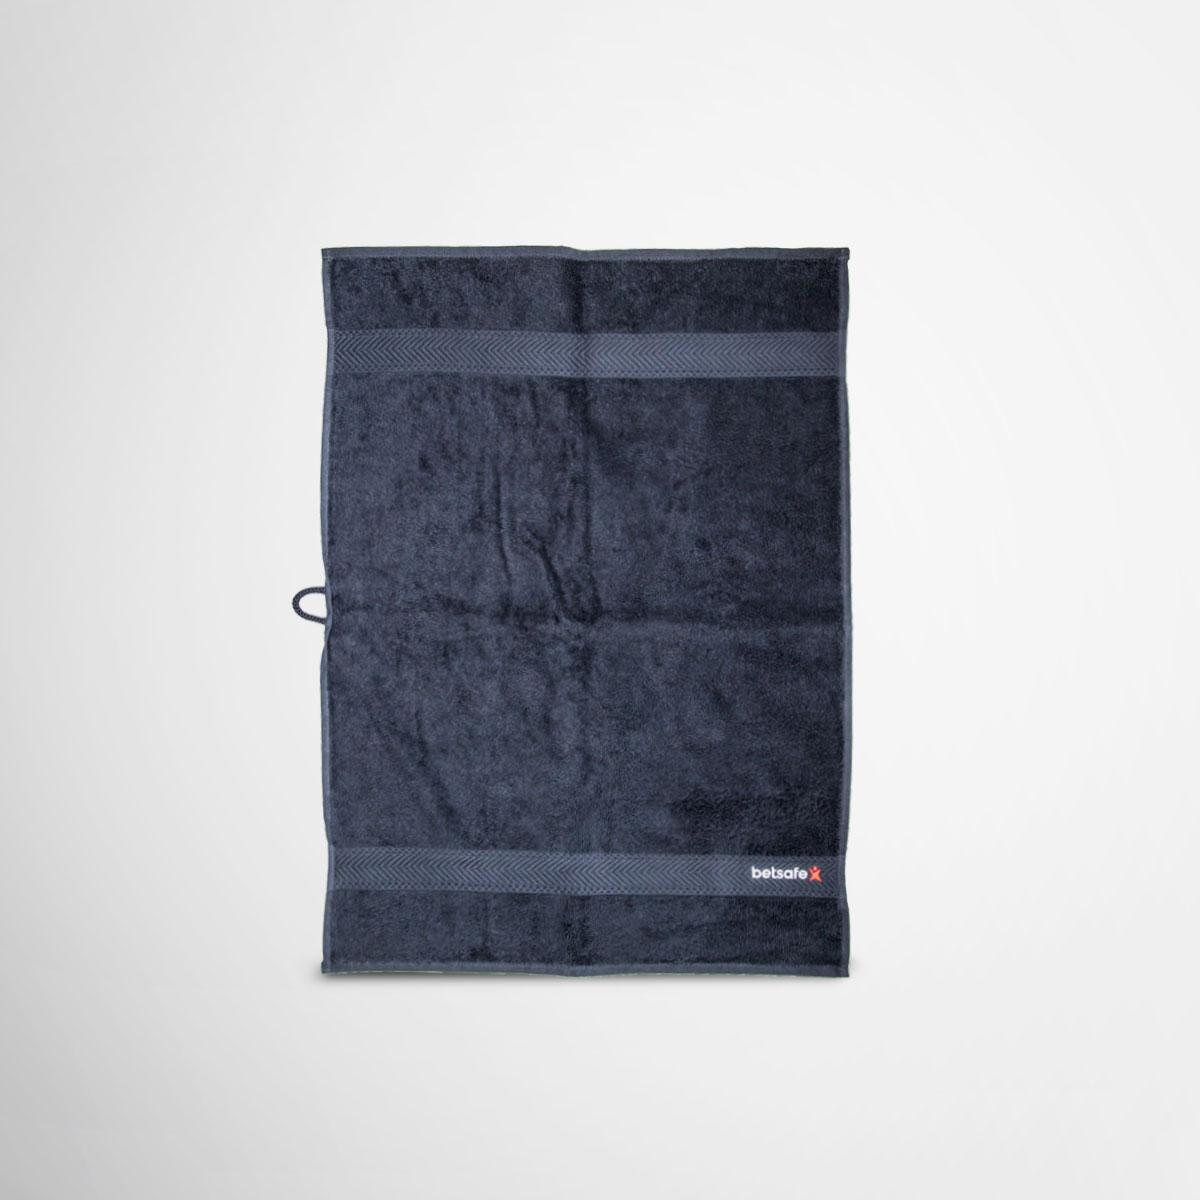 betsafe towel